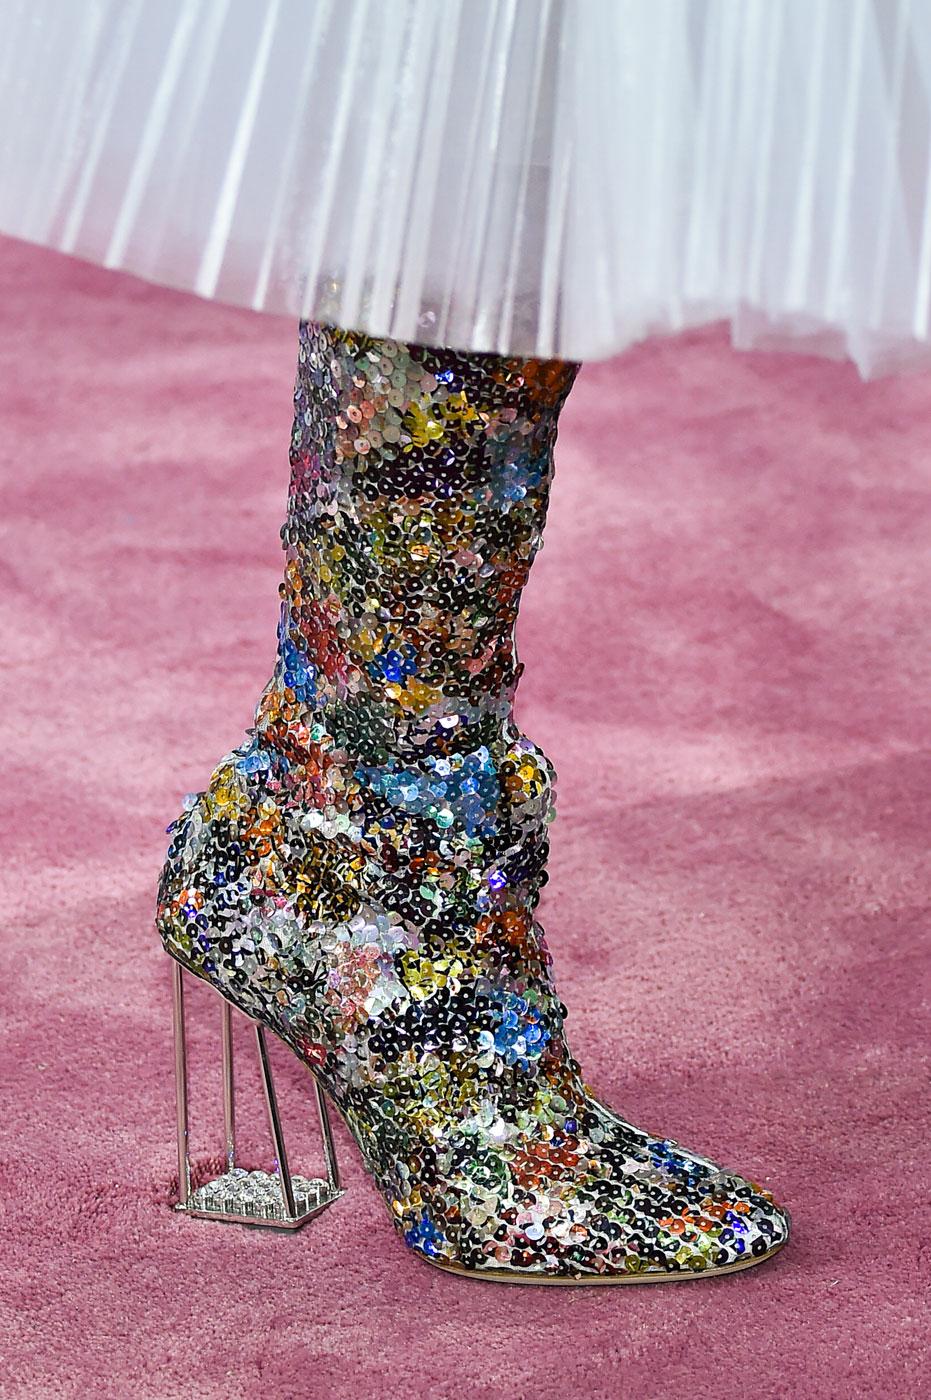 Christian-Dior-fashion-runway-show-close-ups-haute-couture-paris-spring-summer-2015-the-impression-132